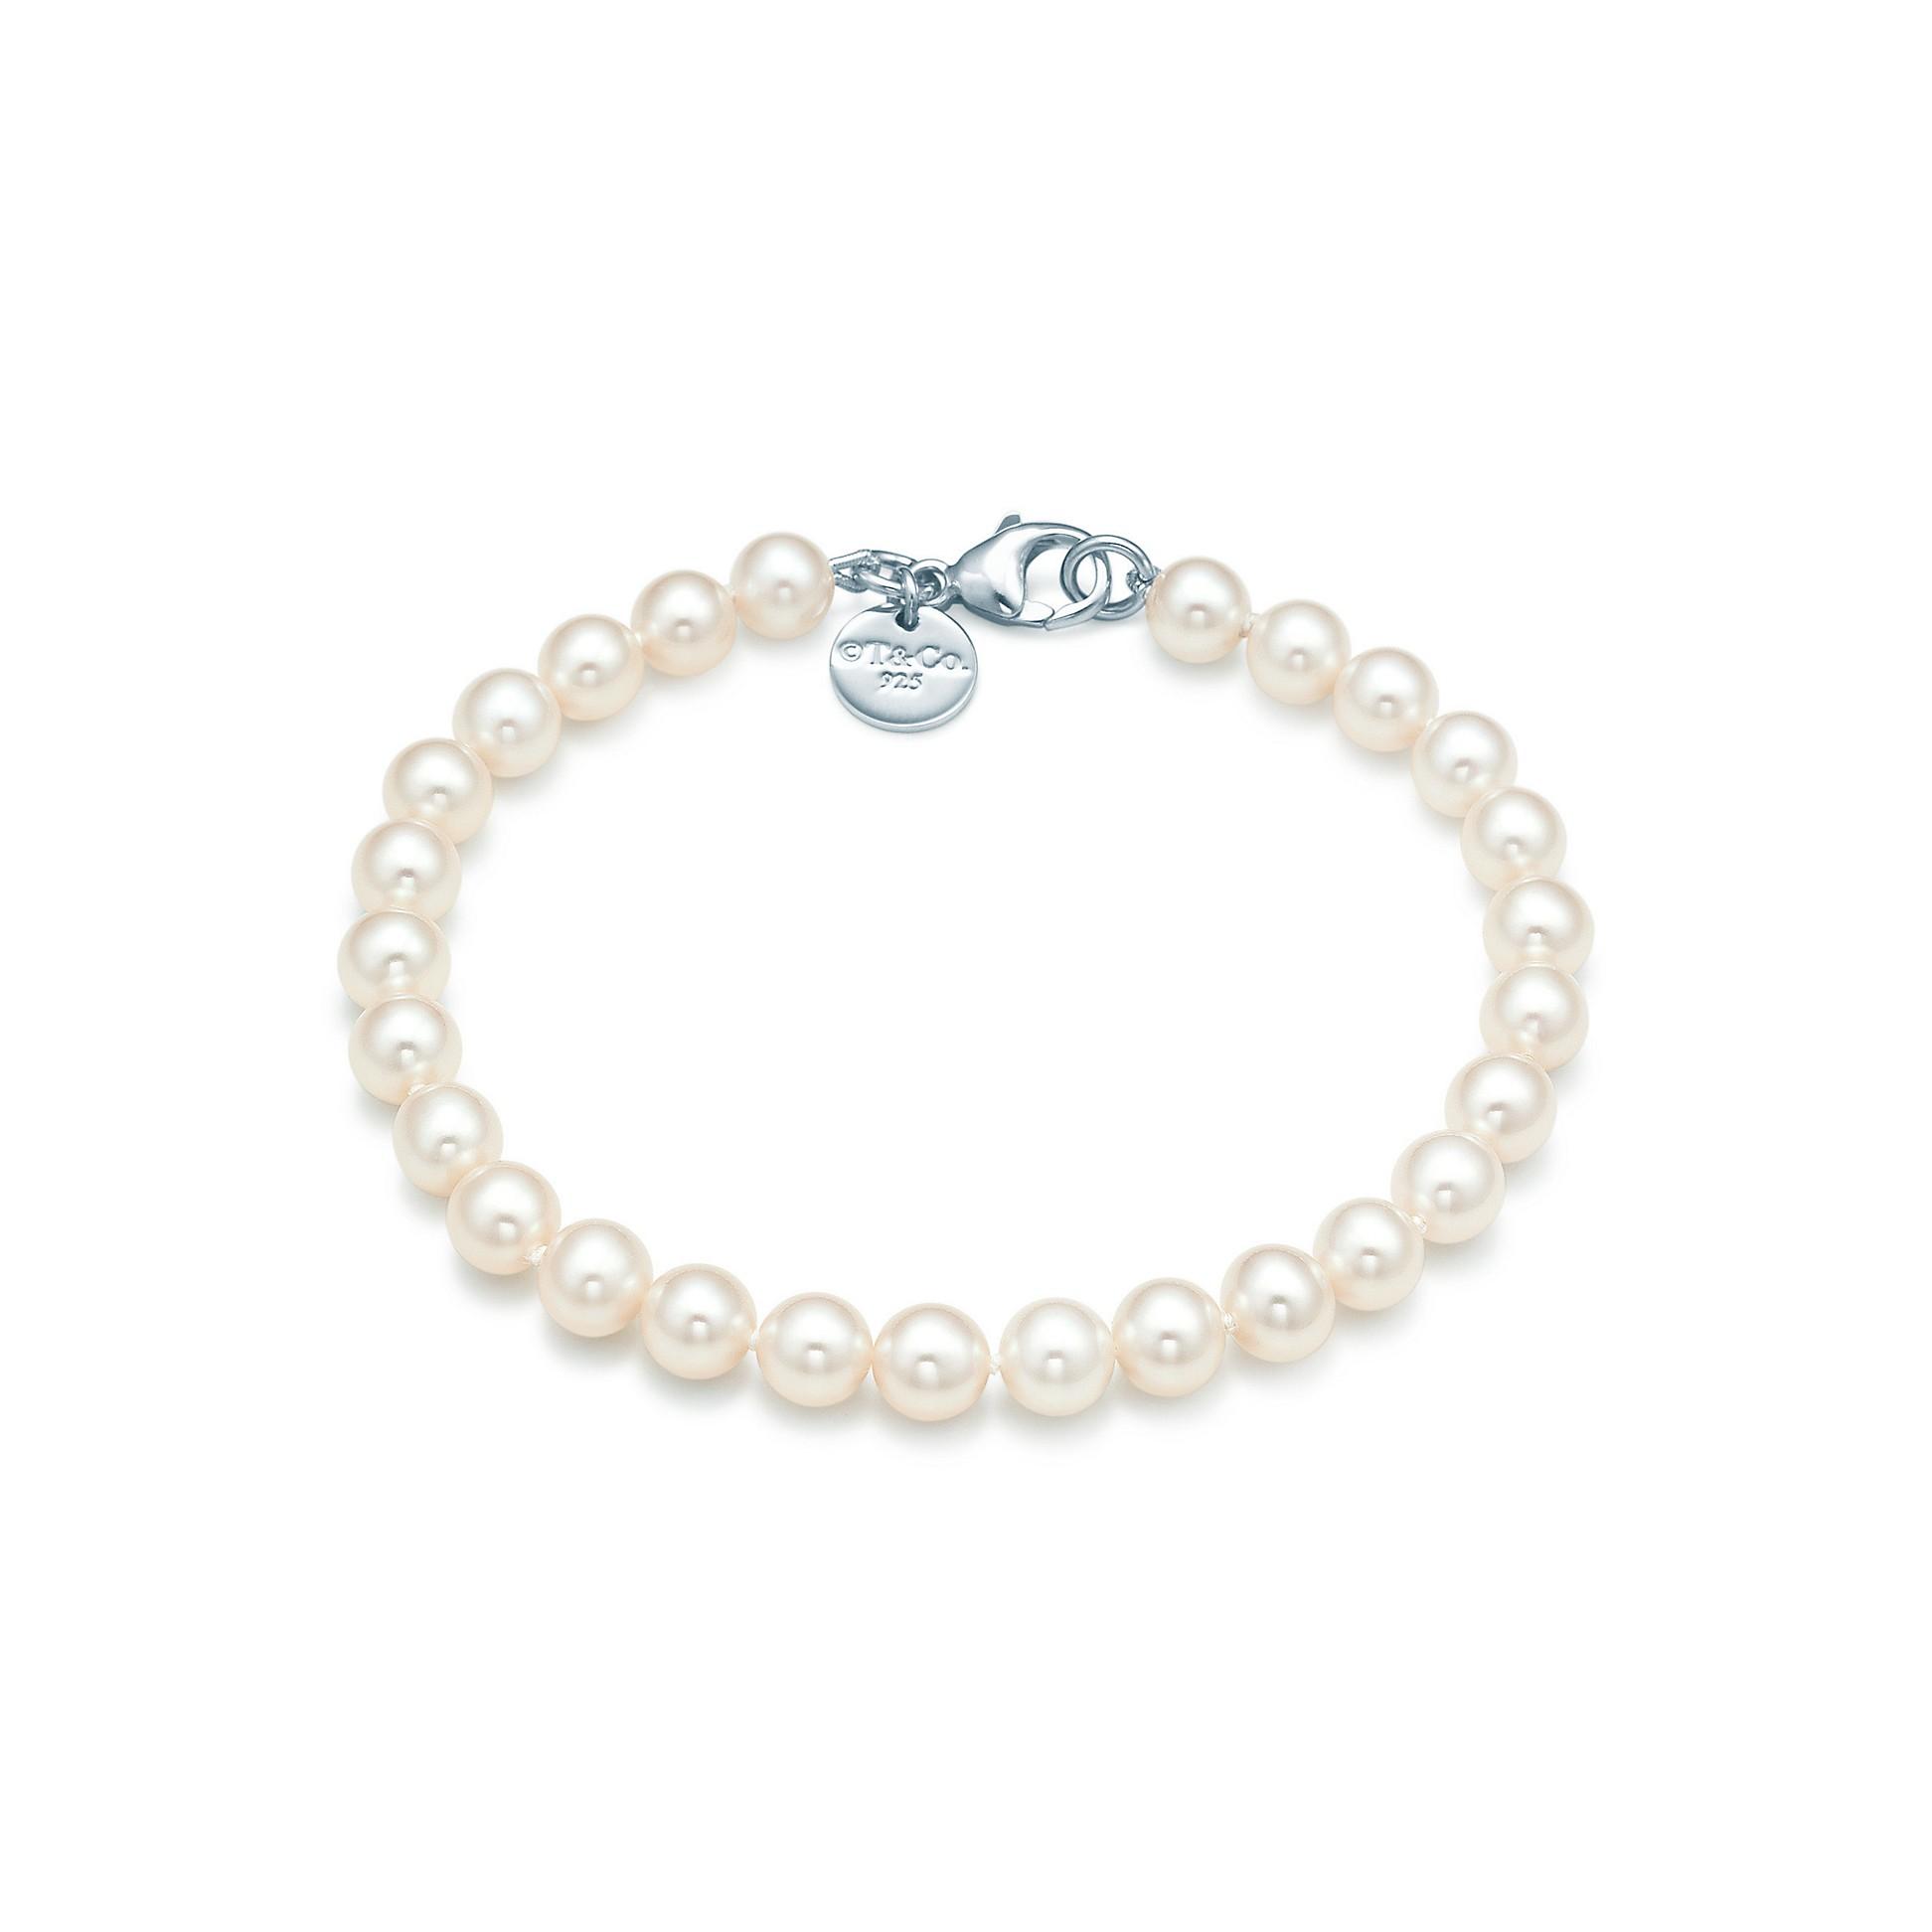 Ziegfeld Collection        Pearl Bracelet by Ziegfeld Collection